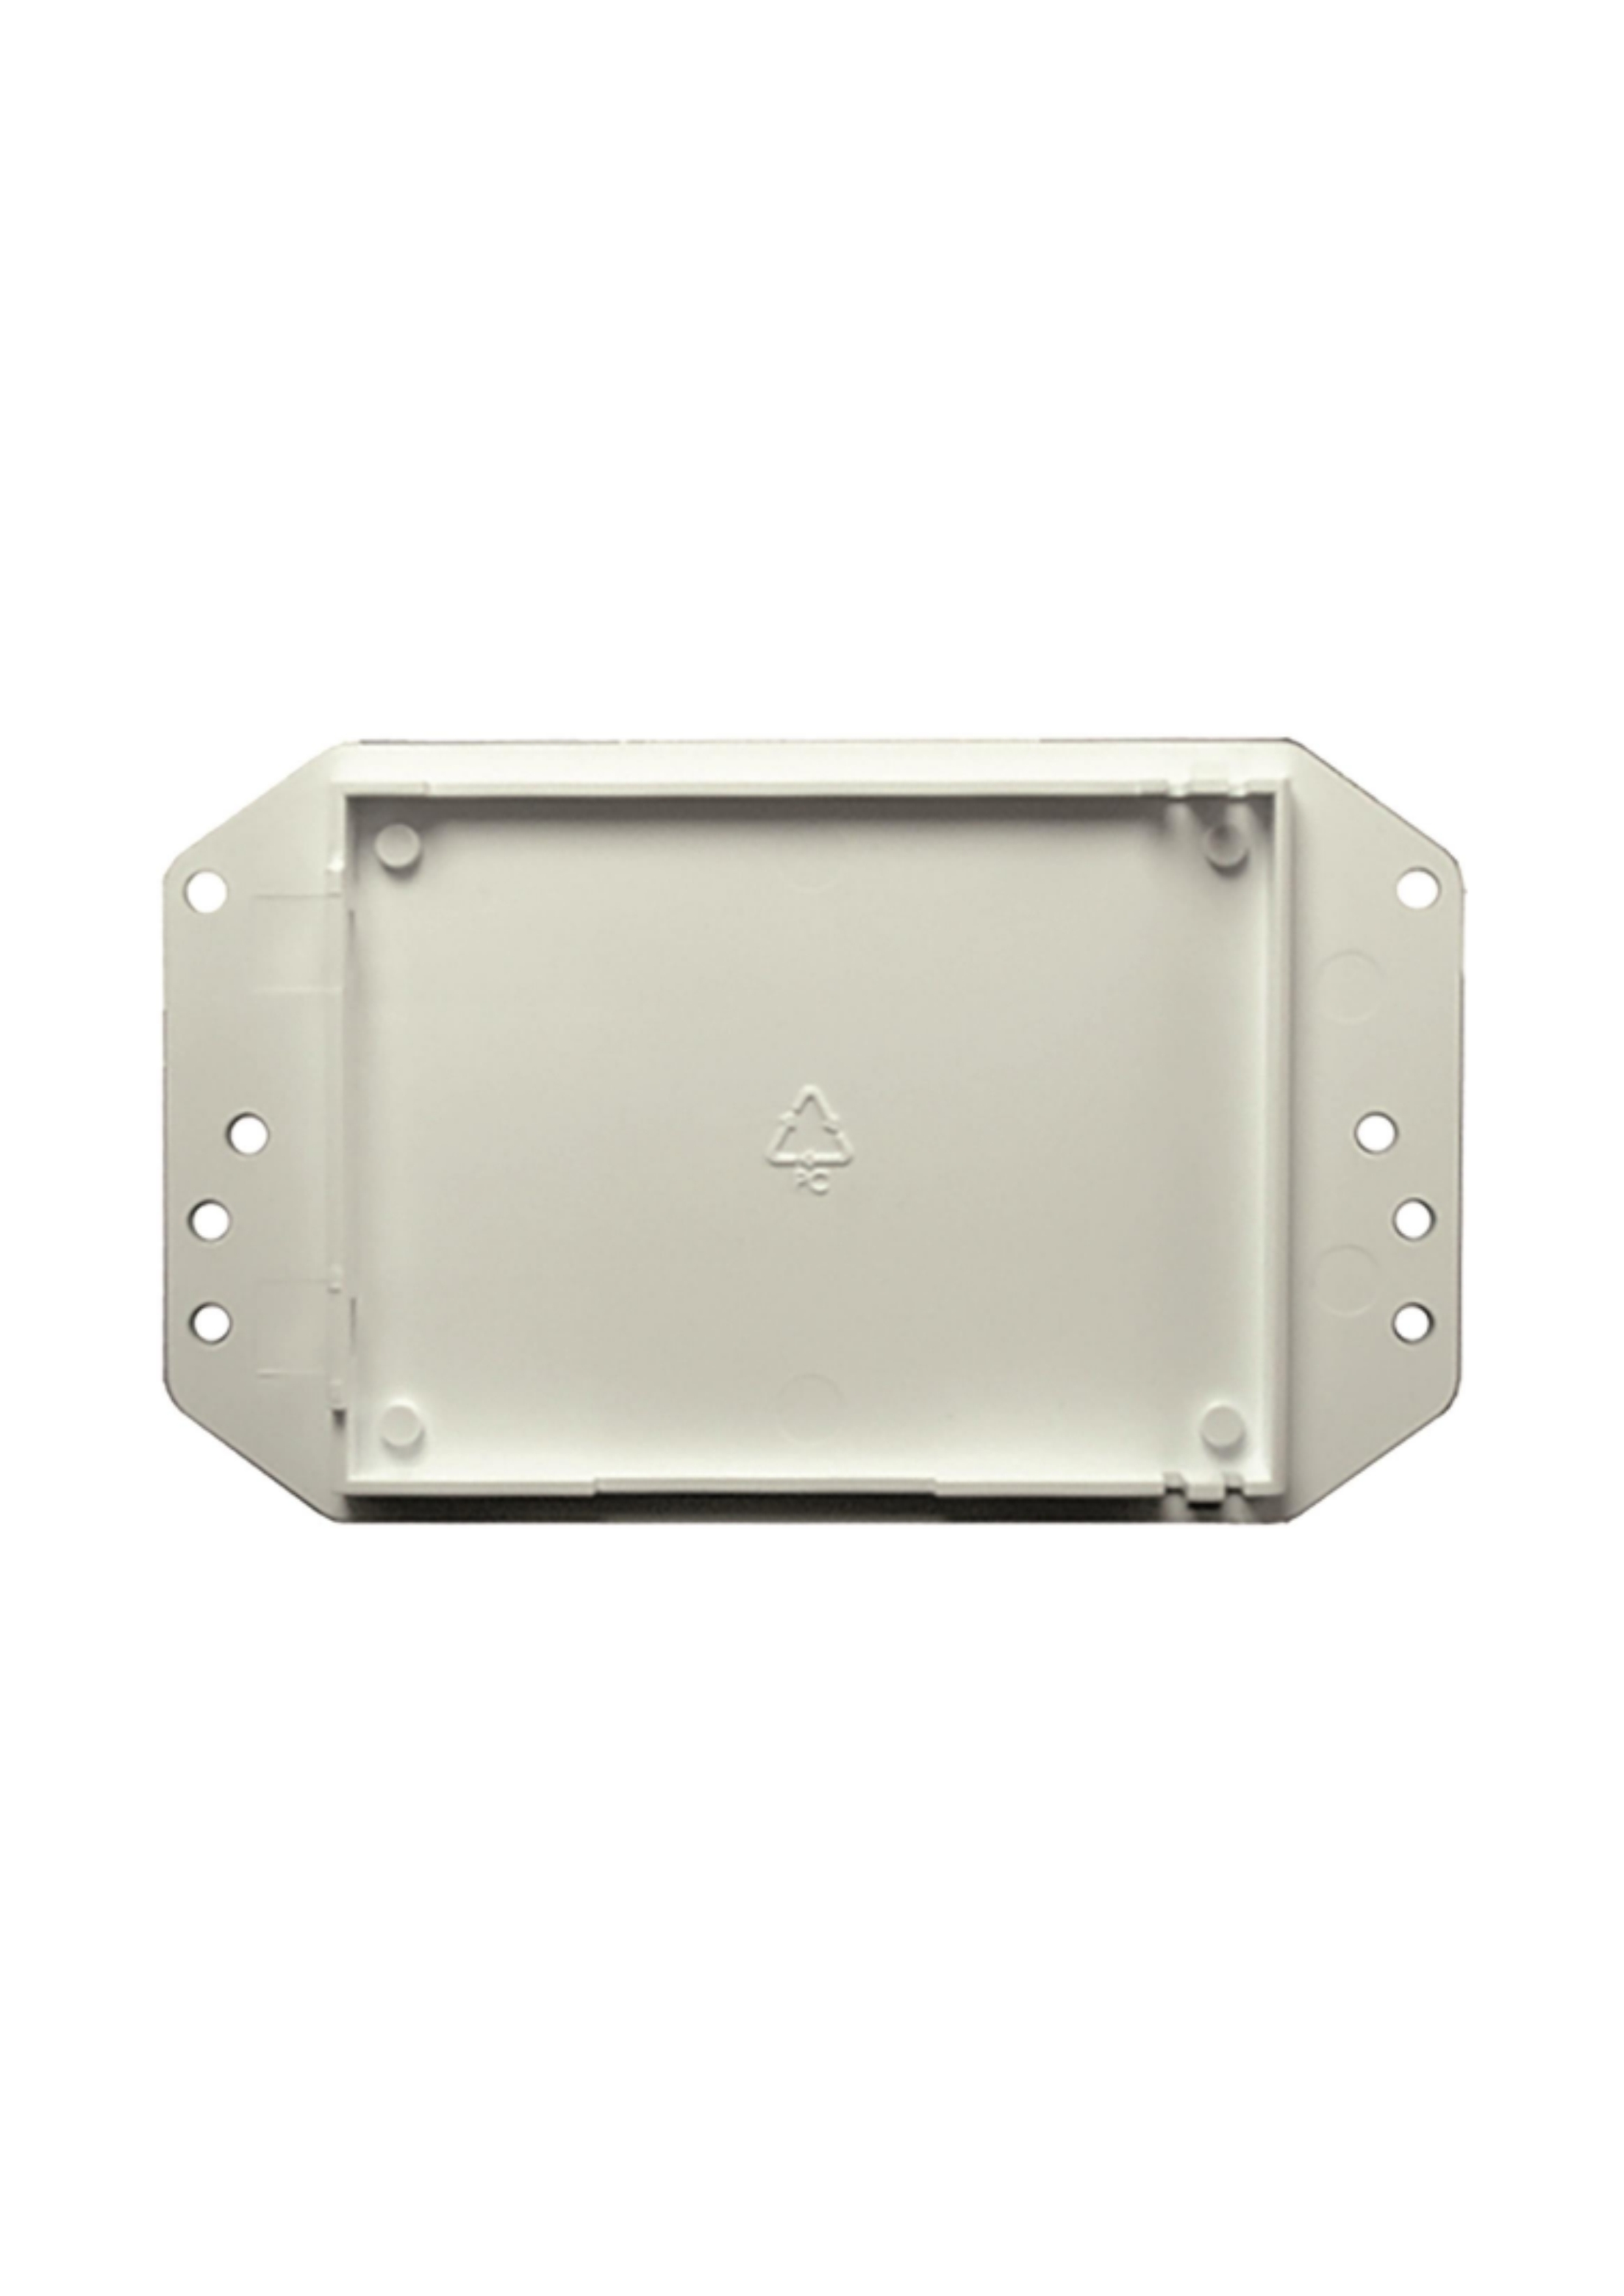 Adaptor for New CHQ Modules 1670970-00